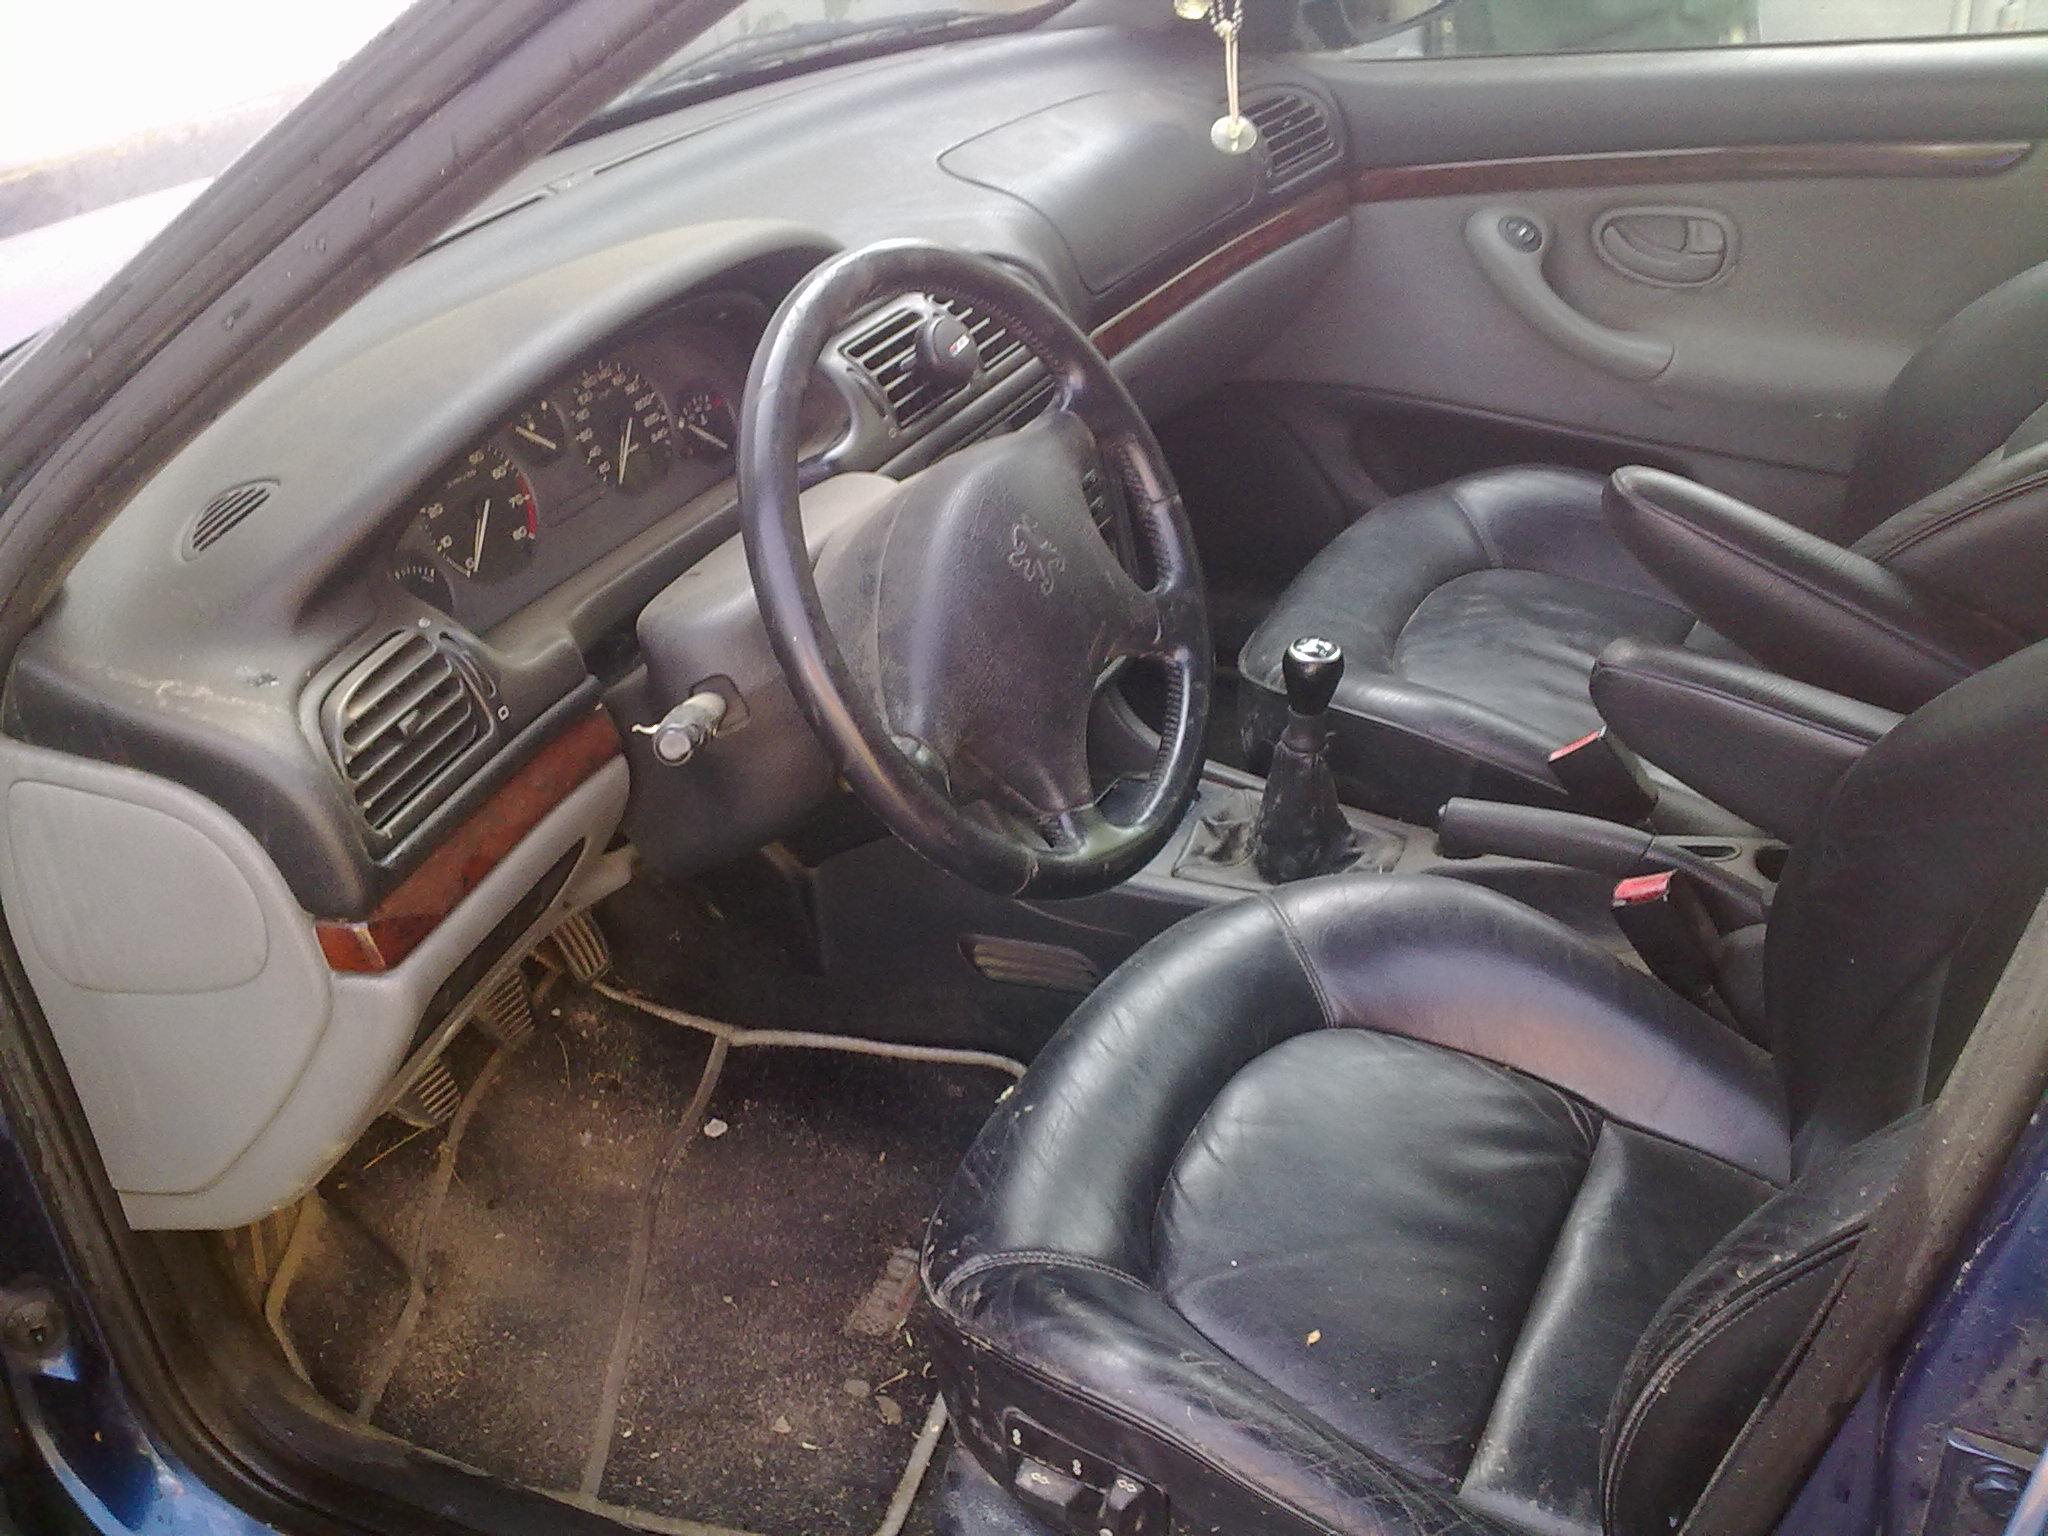 Peugeot 406 avariat 1997 Benzina Berlina - 04 Iunie 2011 - Poza 3